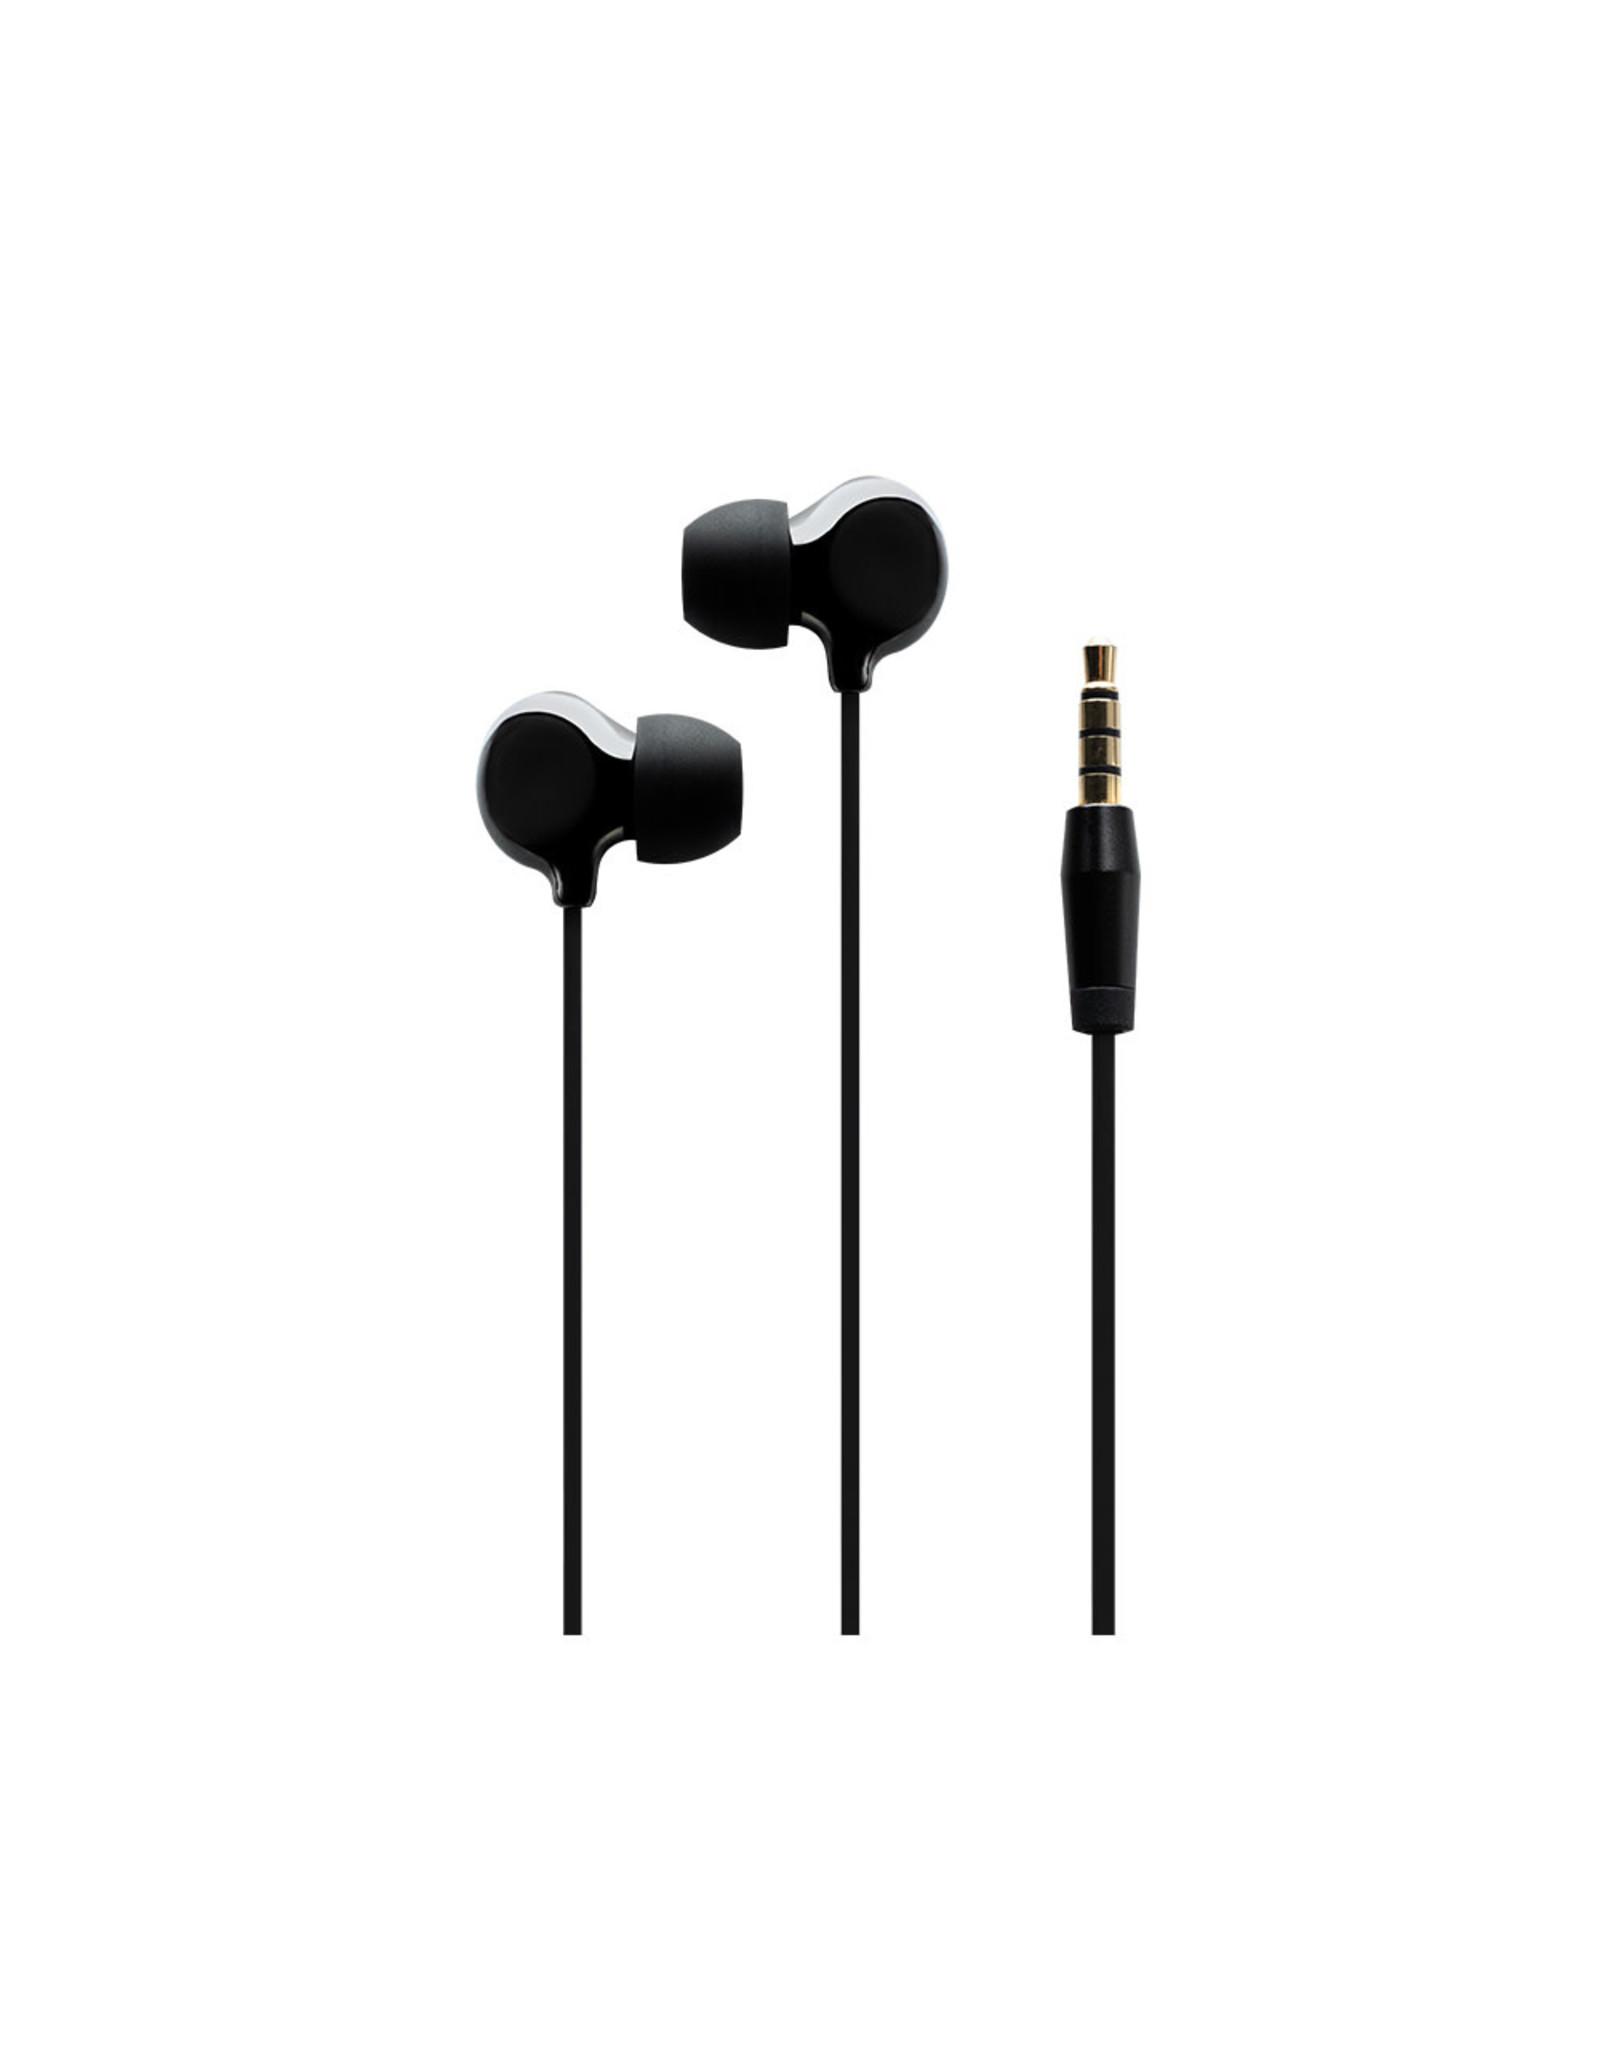 BlueDiamond BlueDiamond, SmartTone Pro Ceramic Earbuds, Black